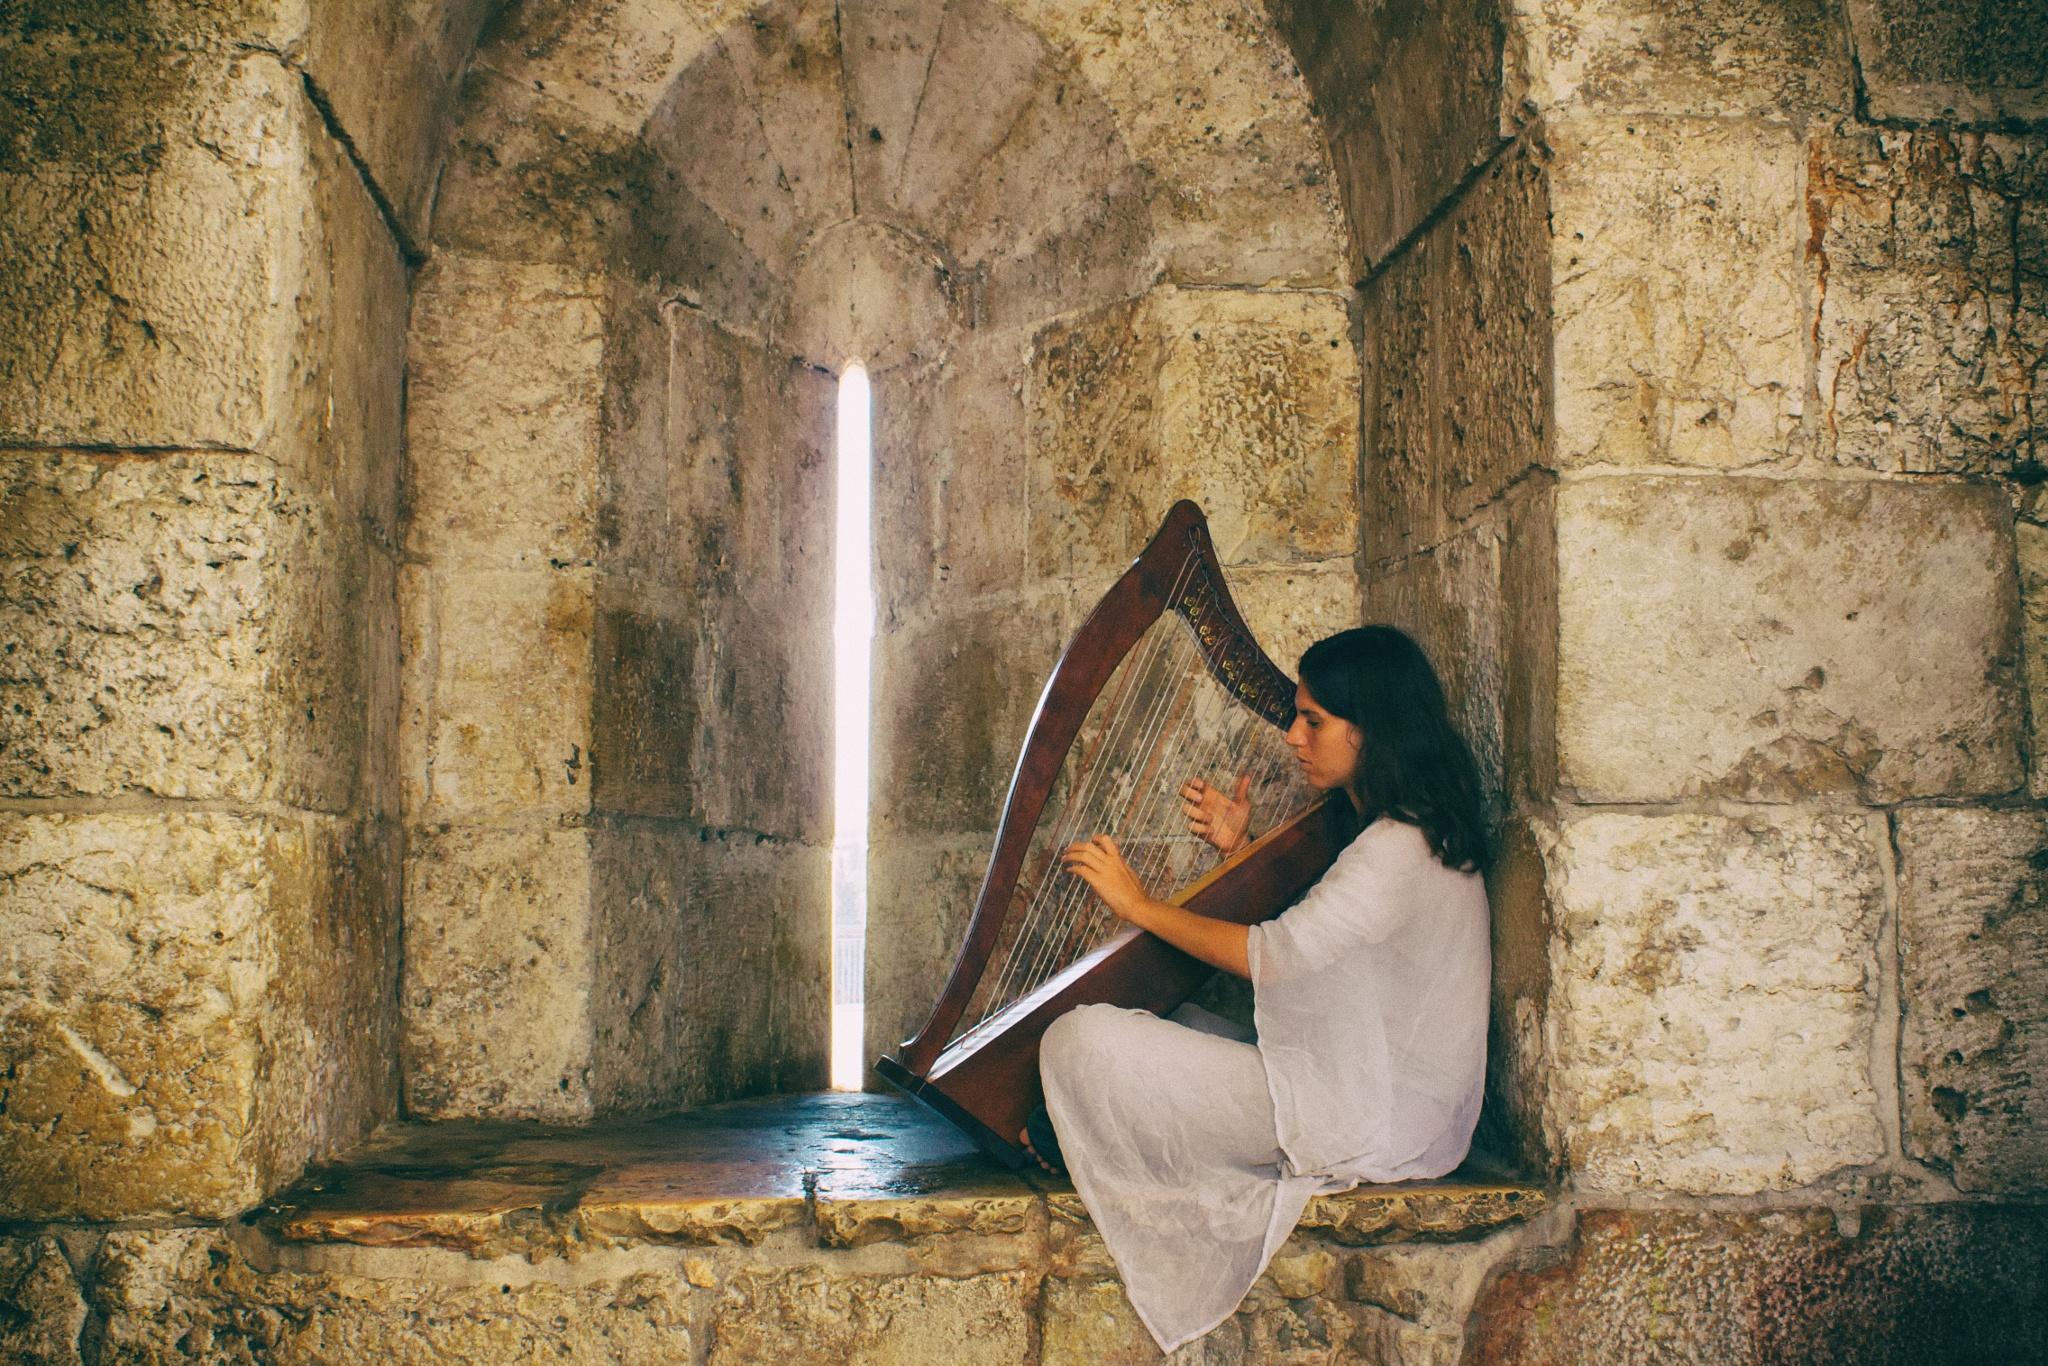 Music in Jaffa Gate by Egor Stronhin